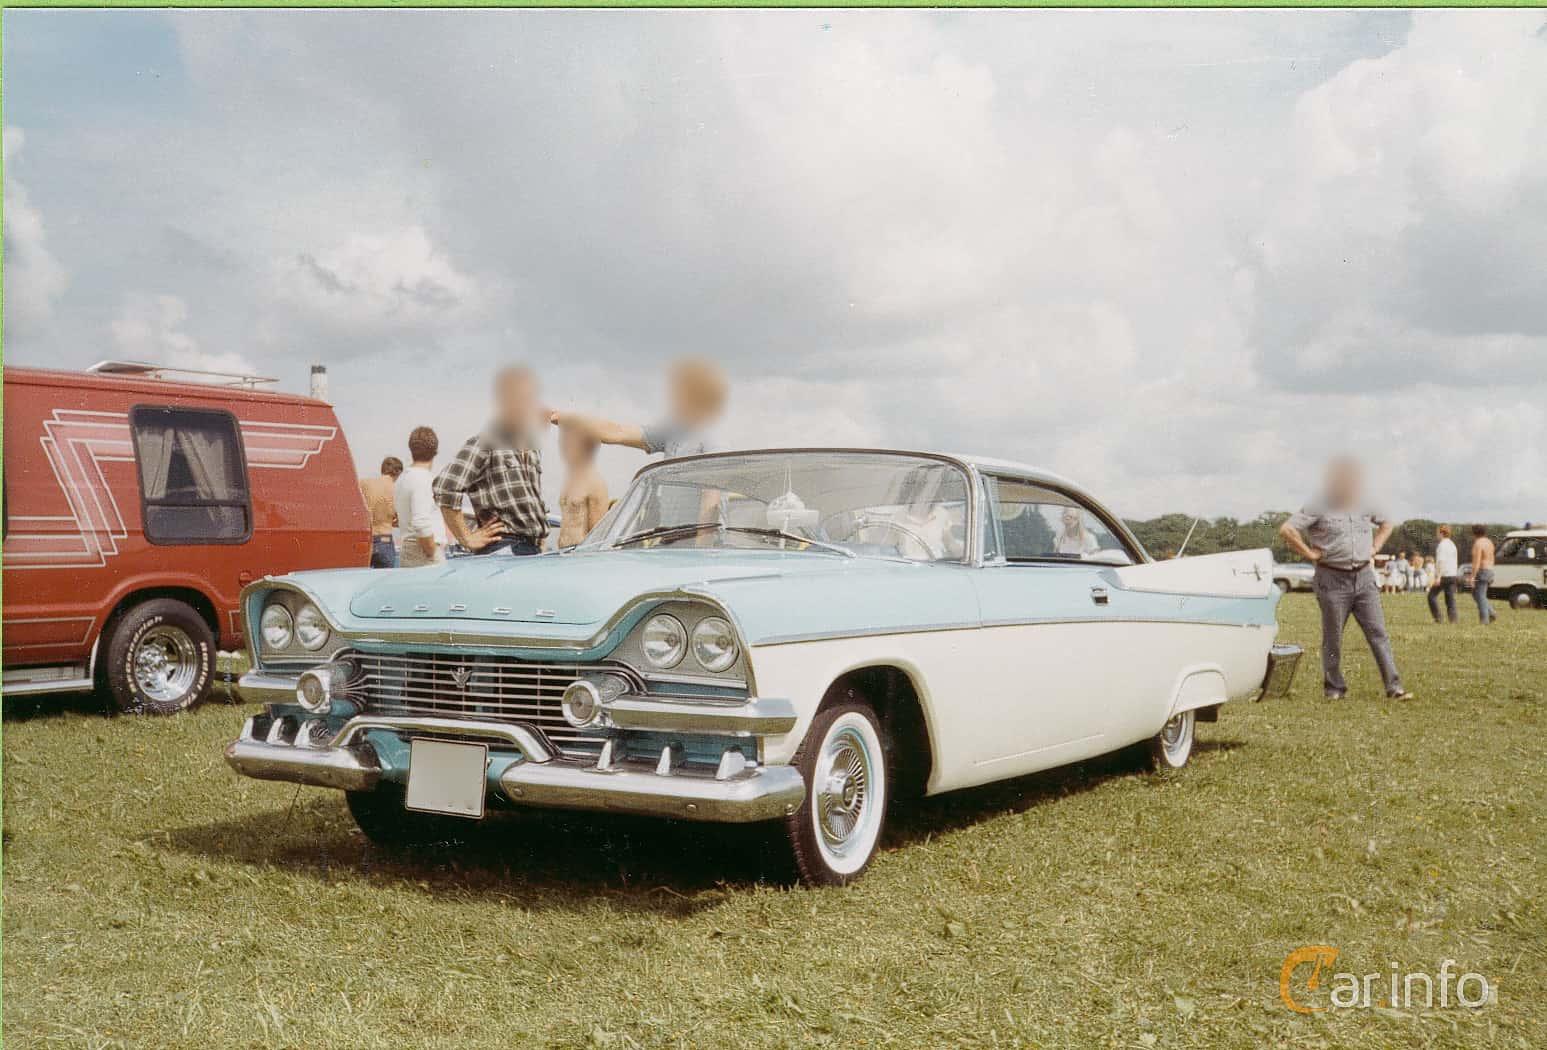 Dodge Coronet Lancer 2-door 5.3 V8 PowerFlite, 256hk, 1958